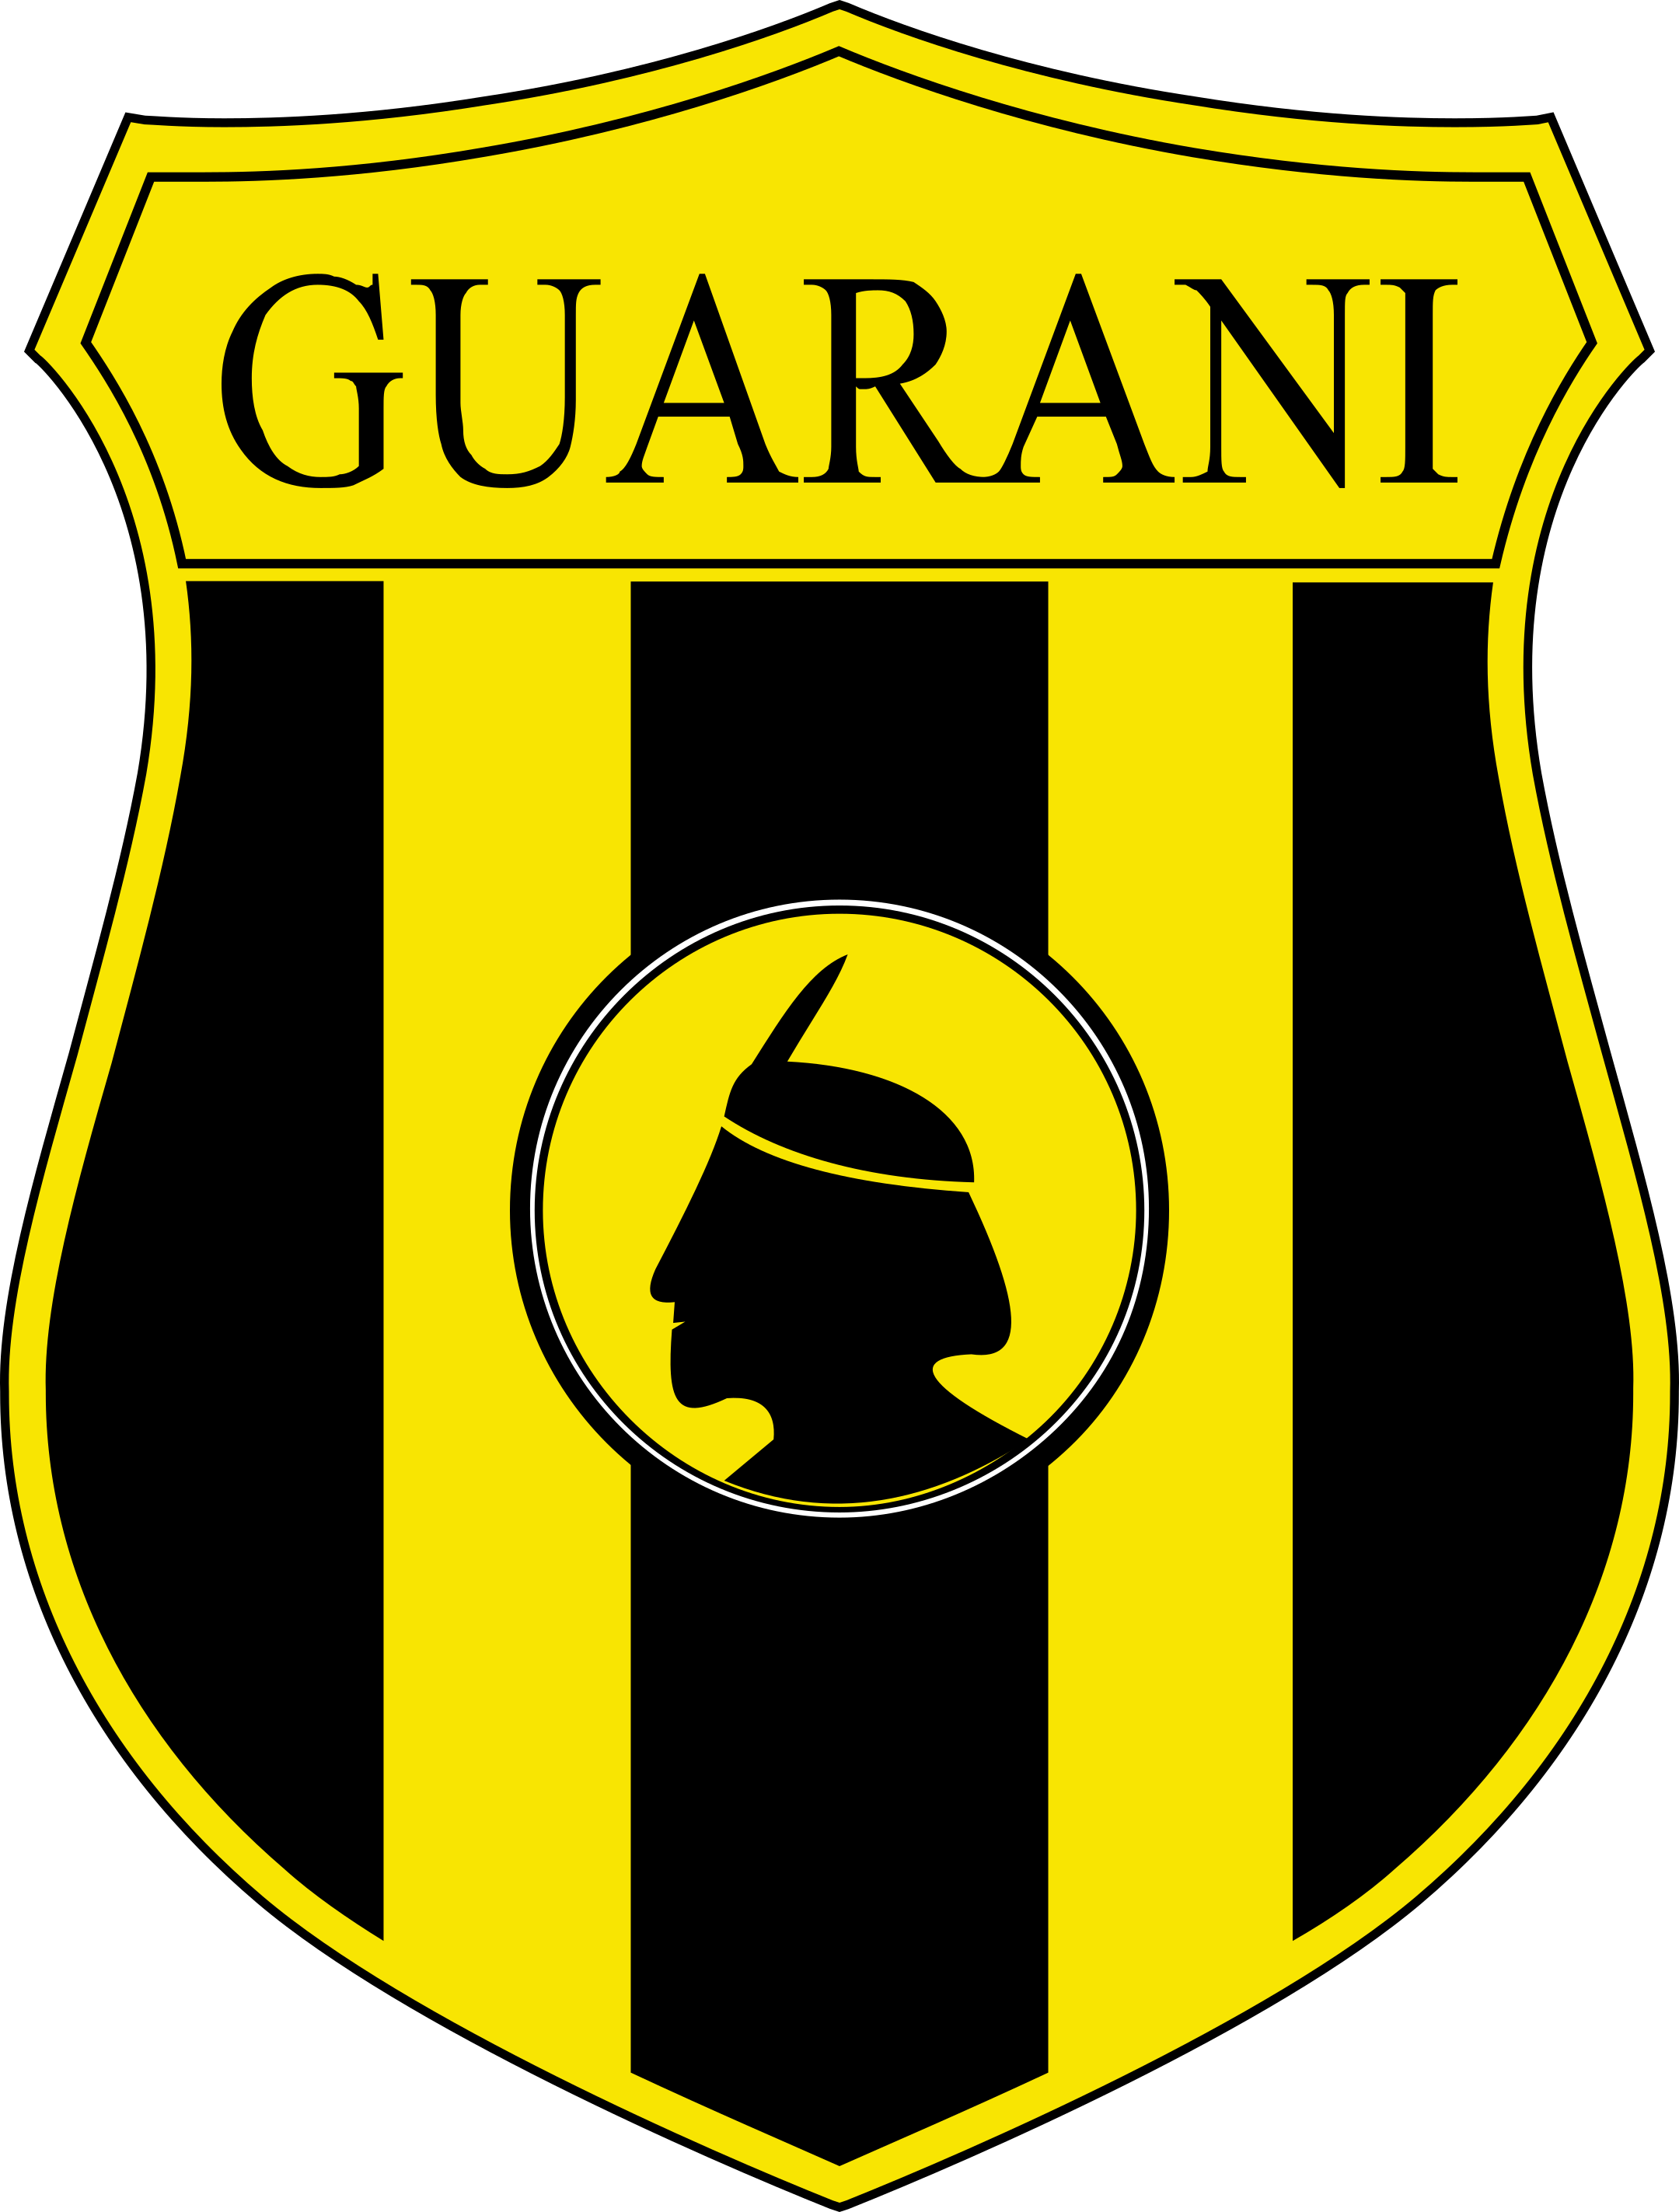 club guarani logo 1 - Club Guaraní Logo